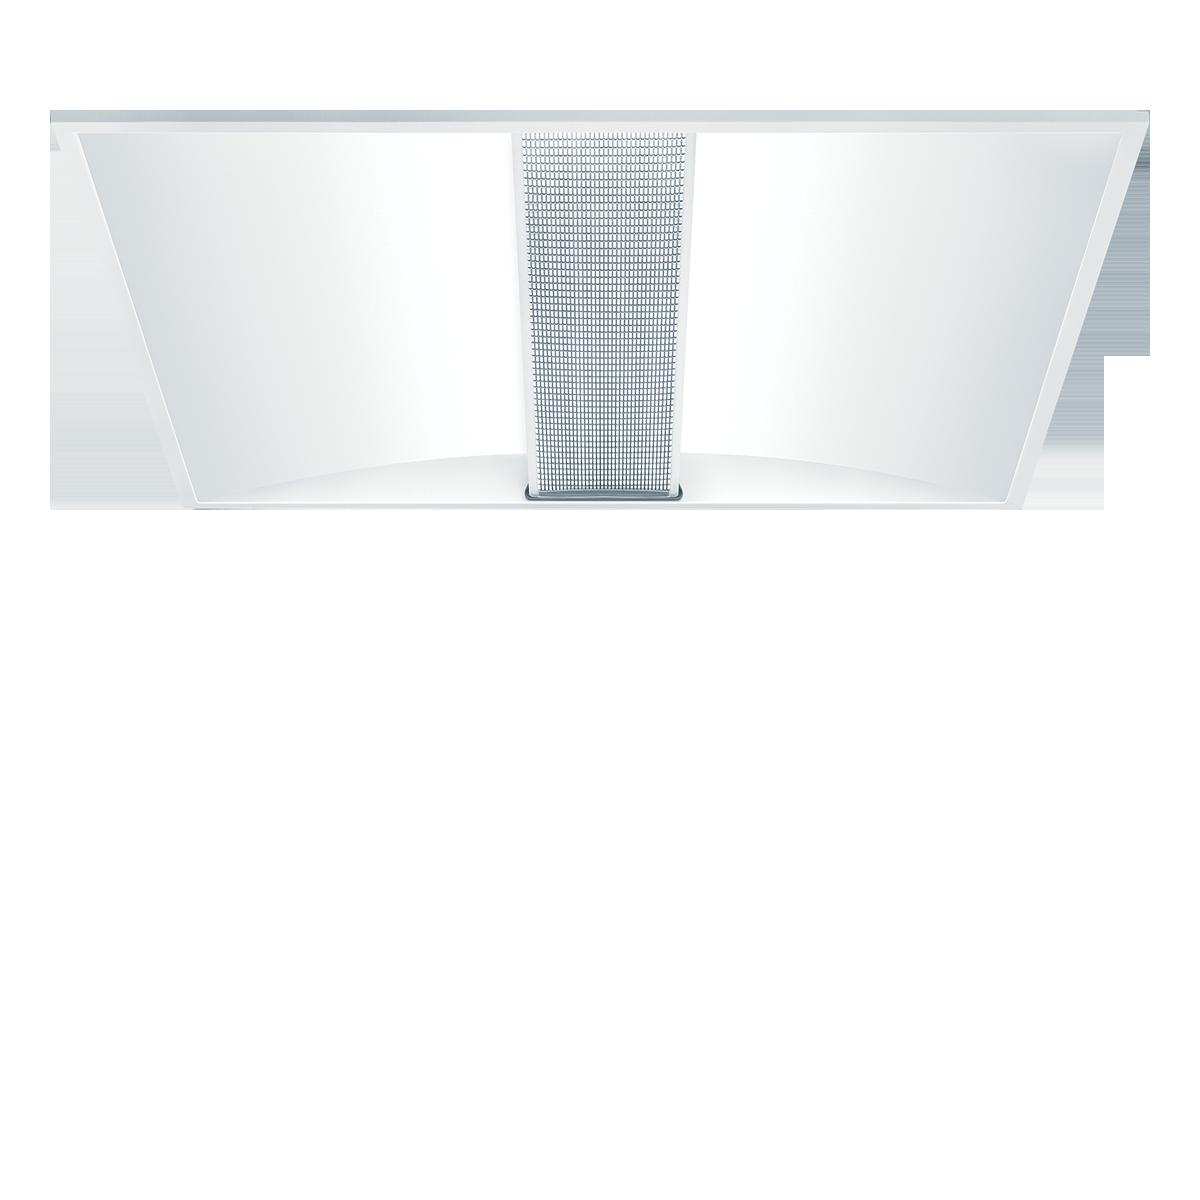 MELLOW LIGHT MELLOW LIGHT IV Recessed \ Mesh Grid Optic 2' x 2'